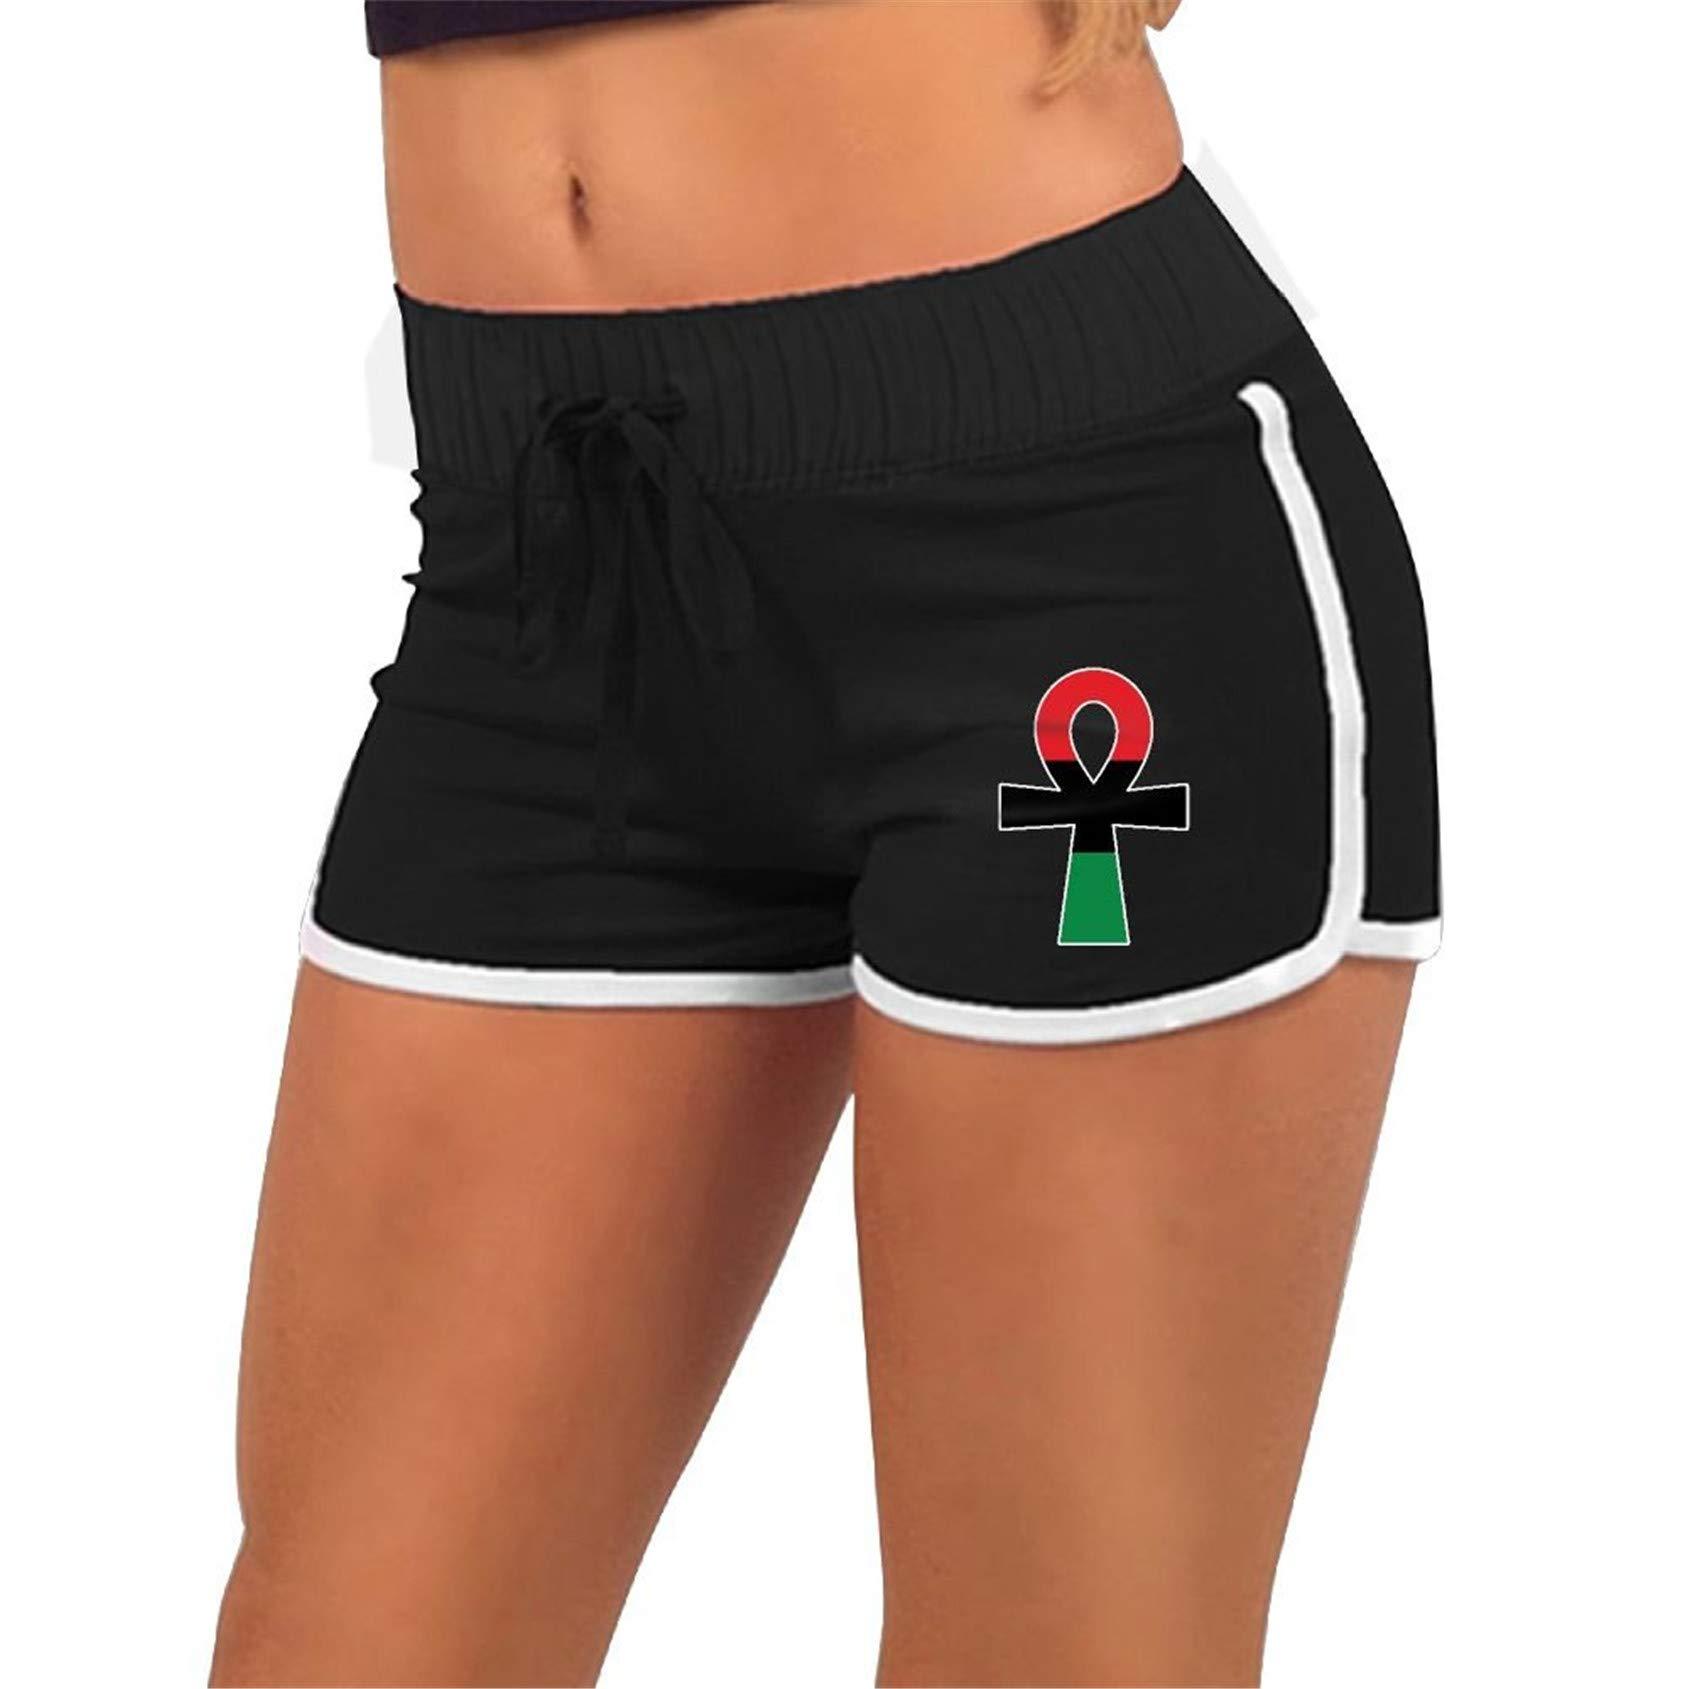 Red, Black Green Ankh,Yoga Shorts Pants with,Athletic Elastic Waist Womens Sports Shorts